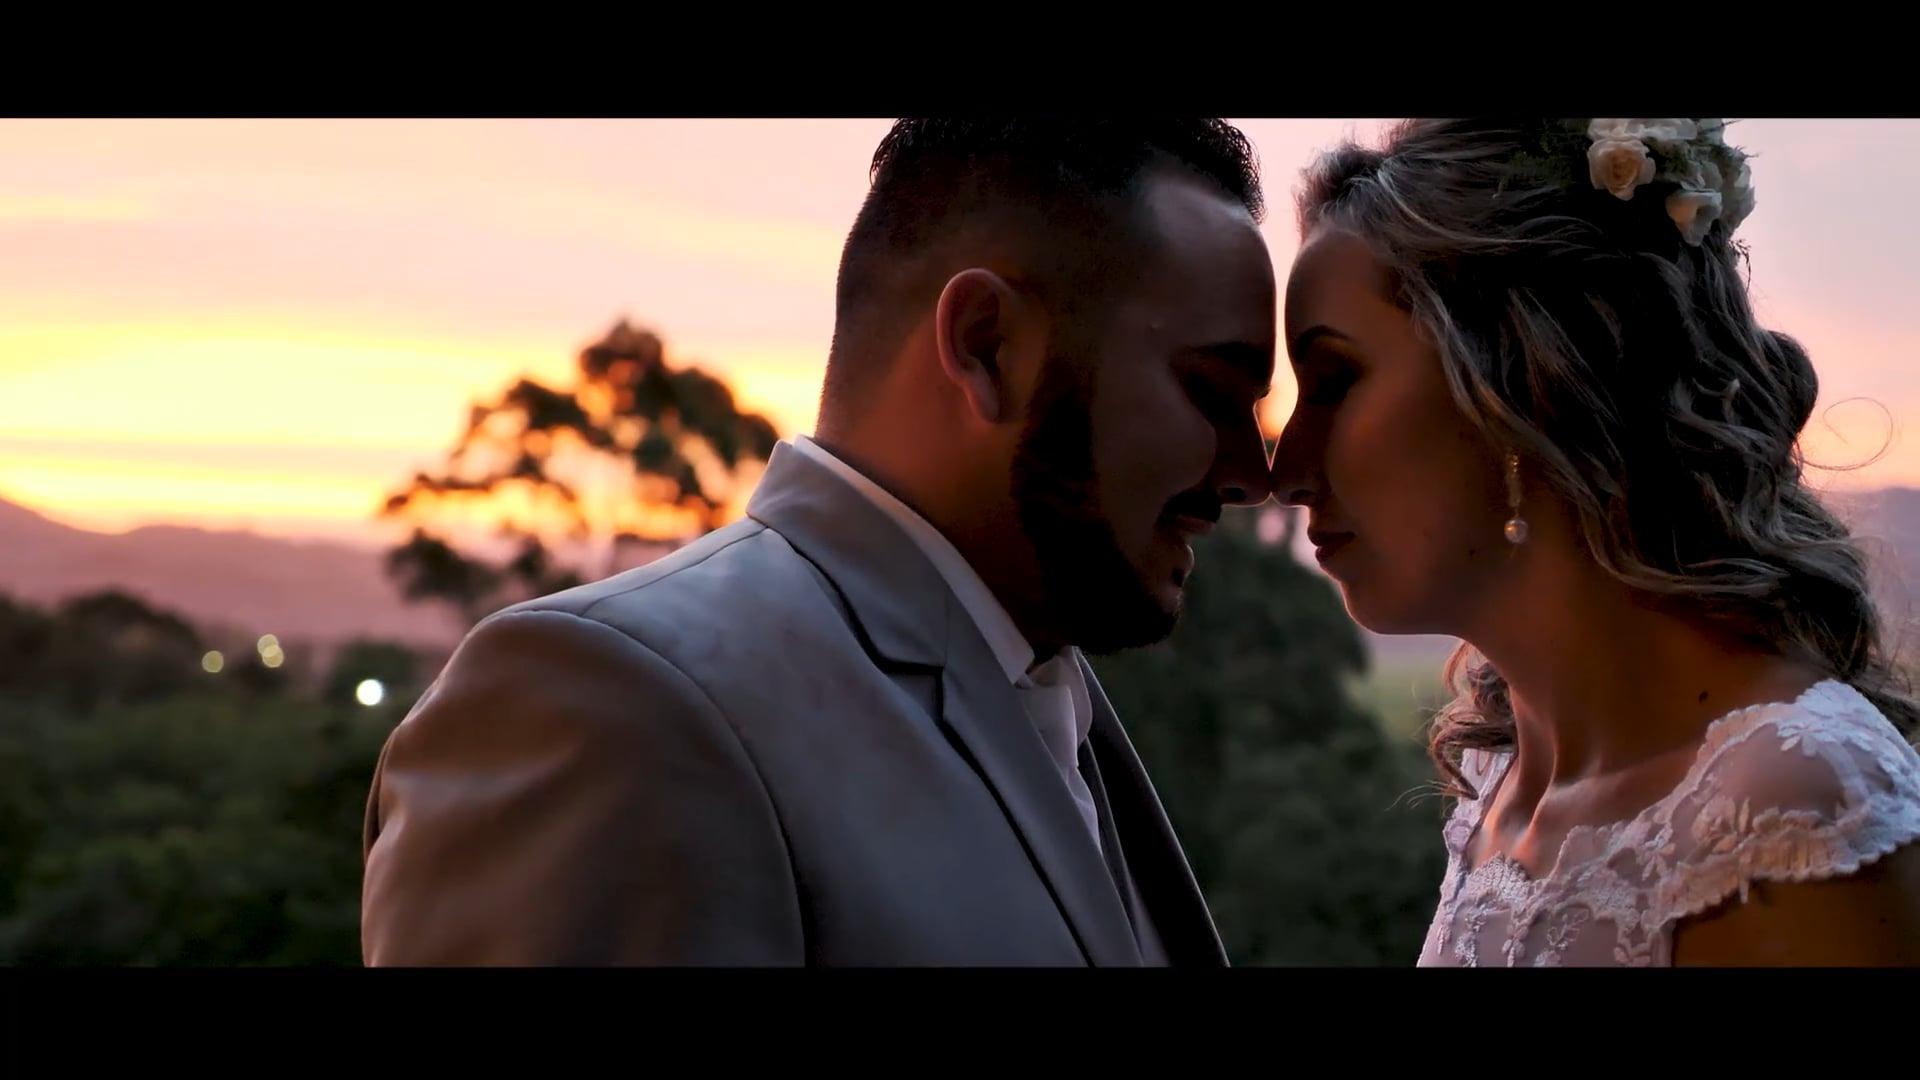 Ilhacolor Vídeo Produções - Pytter Coelho